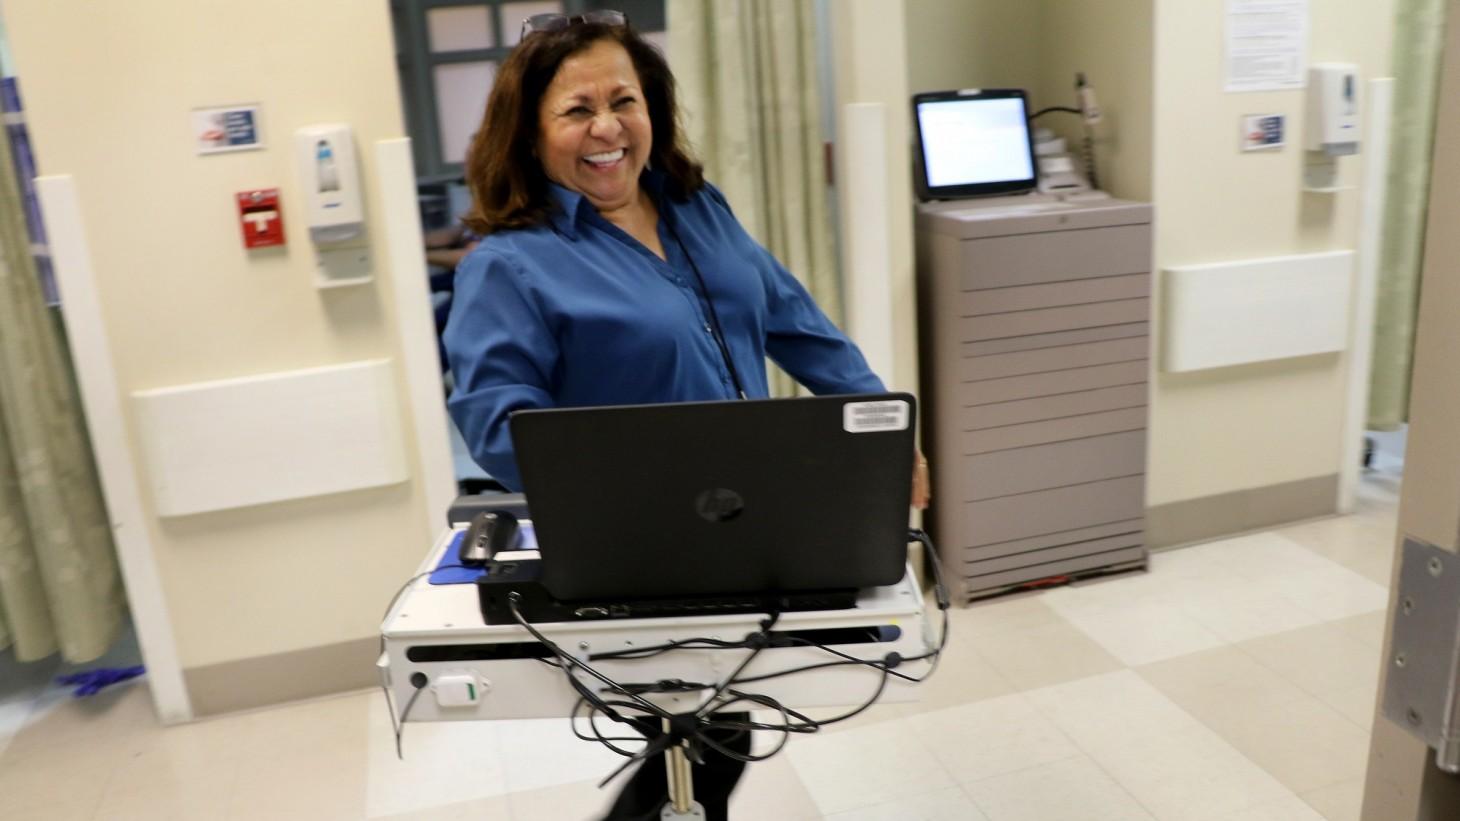 Ninneth O'Hara, with laptop on wheels.